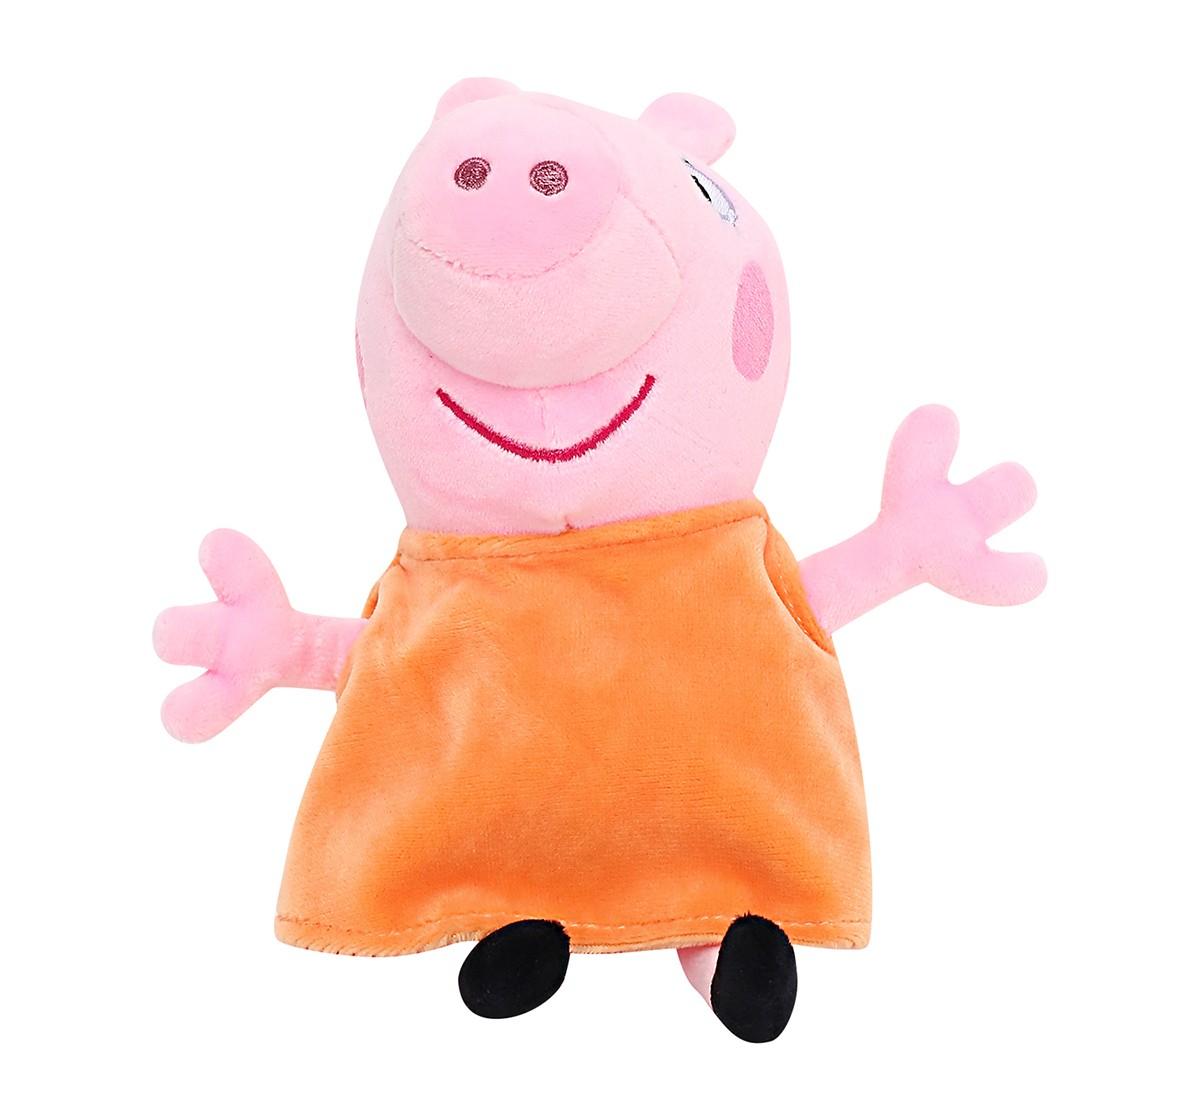 Peppa Pig Mummy 19 Cm Soft Toy for Kids age 3Y+ (Pink)